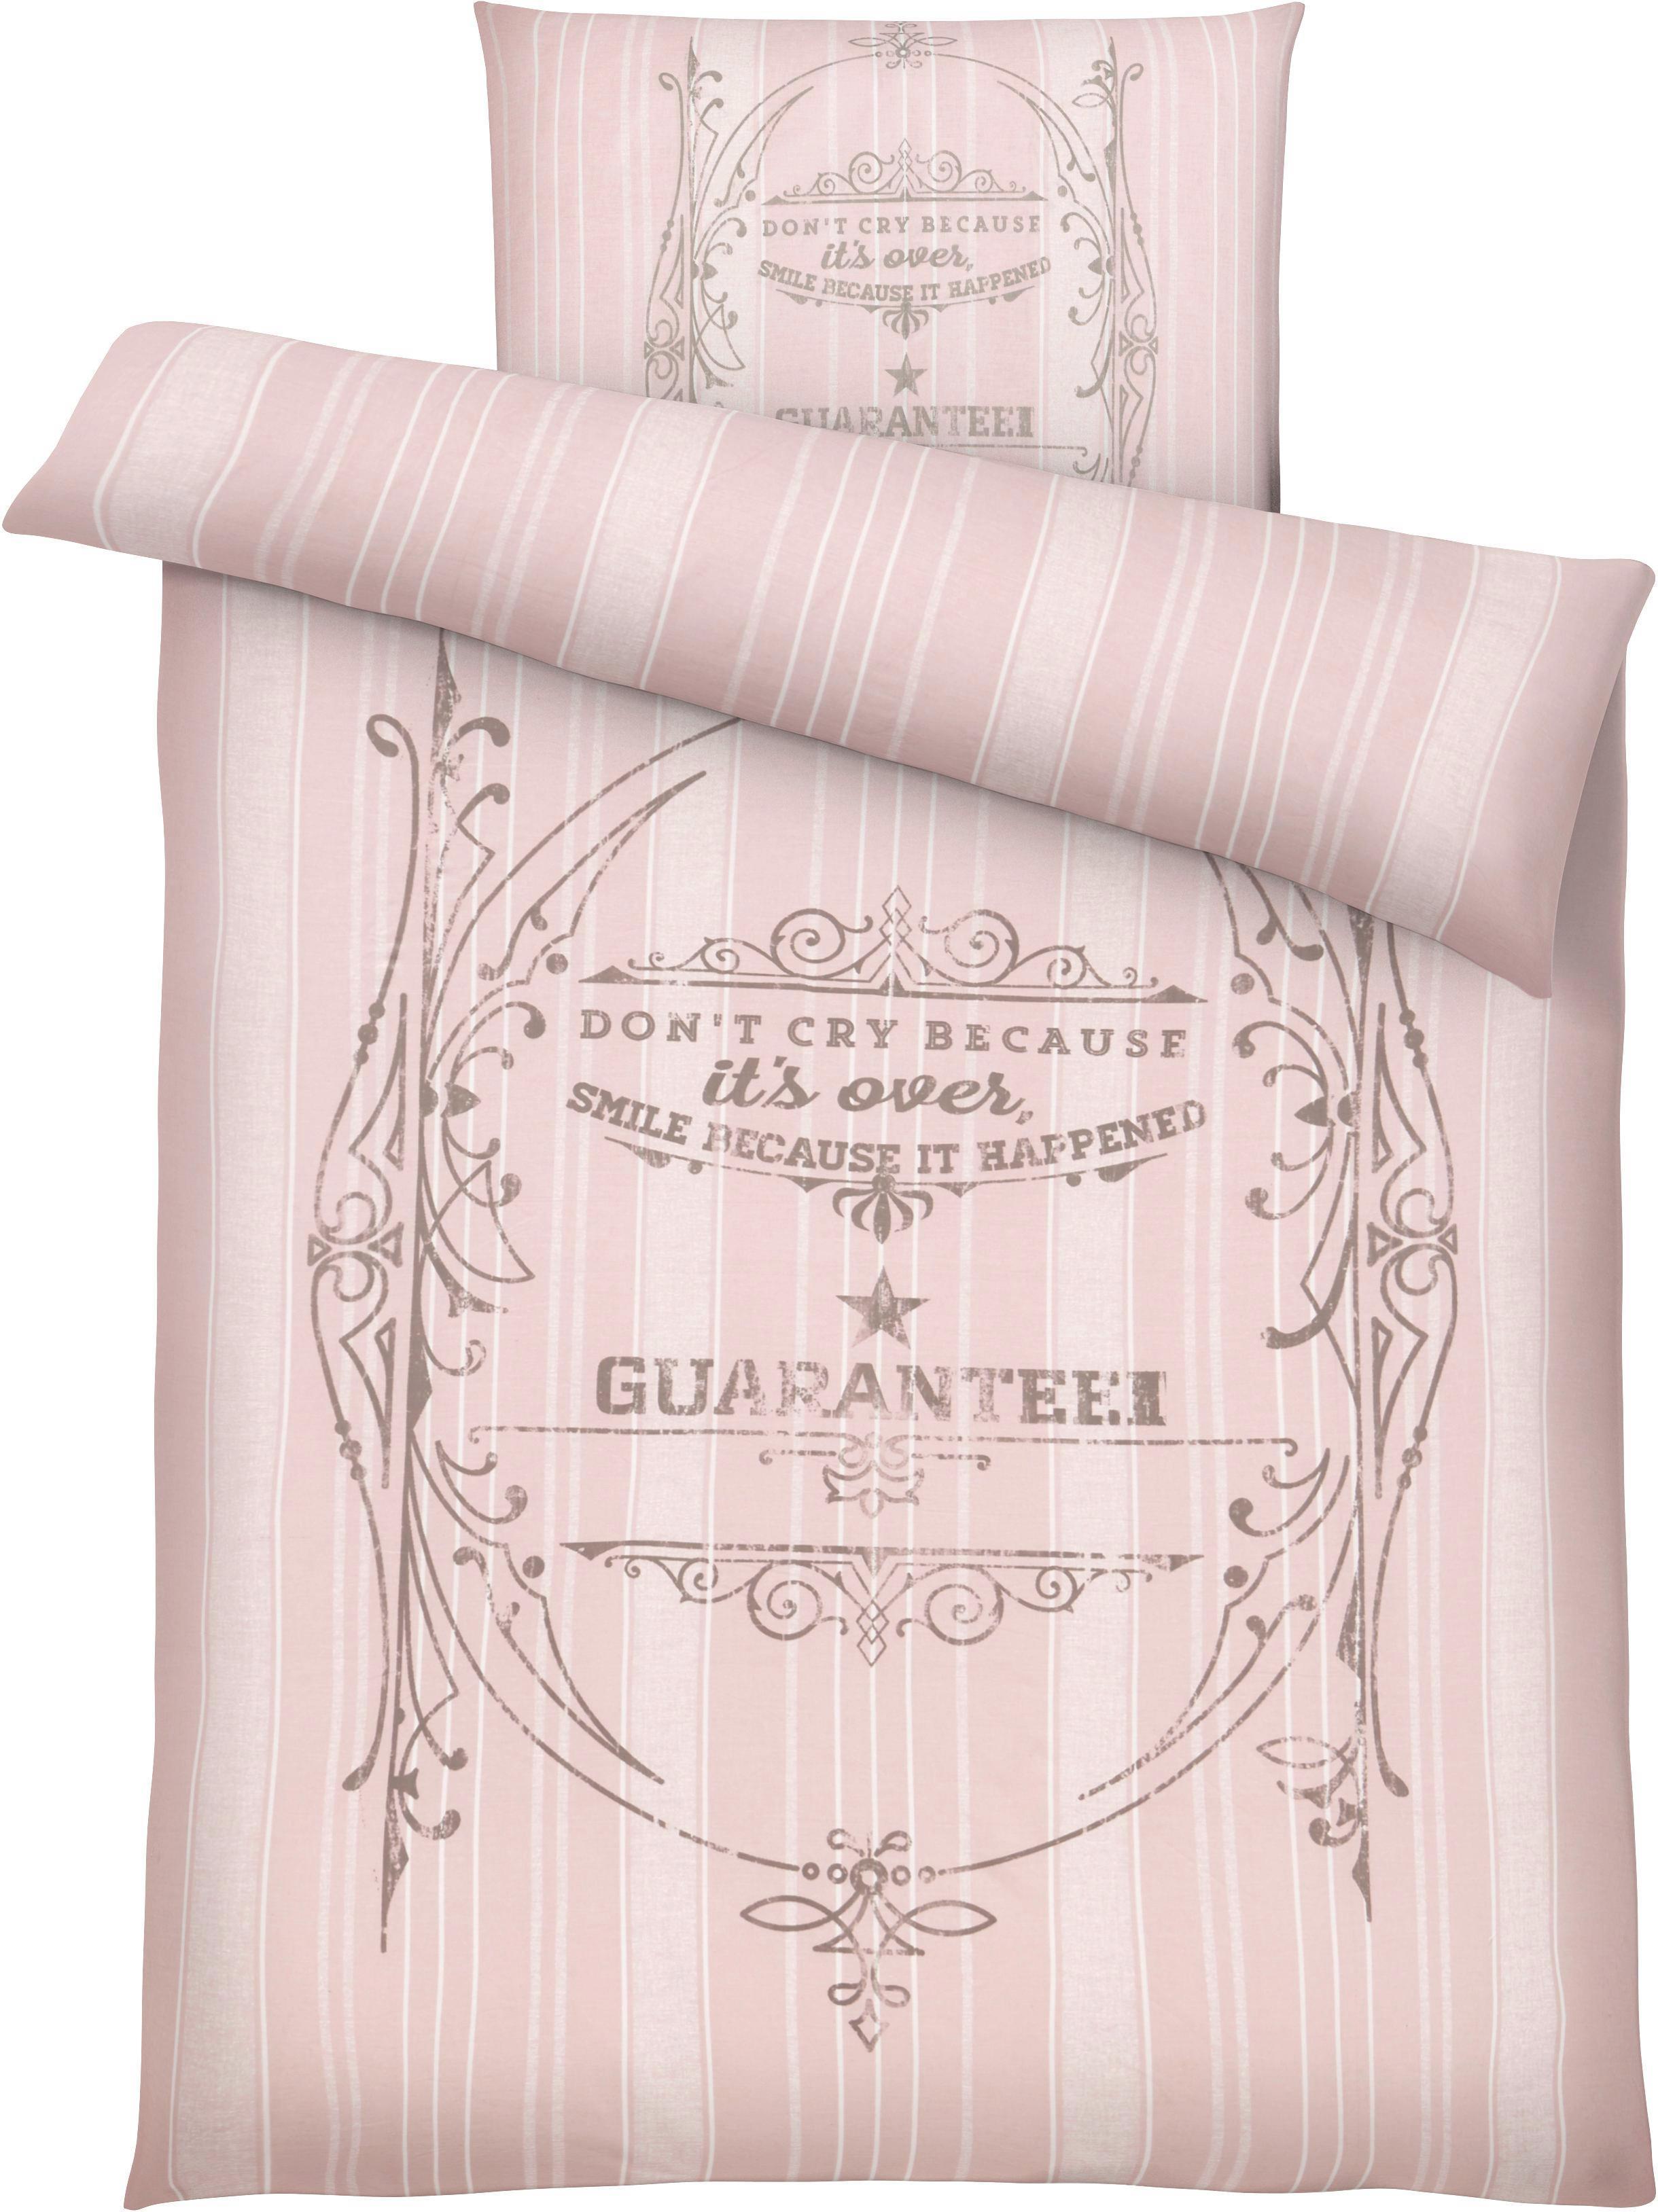 Bettwäsche Elise, ca. 135x200cm - Rosa, ROMANTIK / LANDHAUS, Textil (135/200cm) - MÖMAX modern living